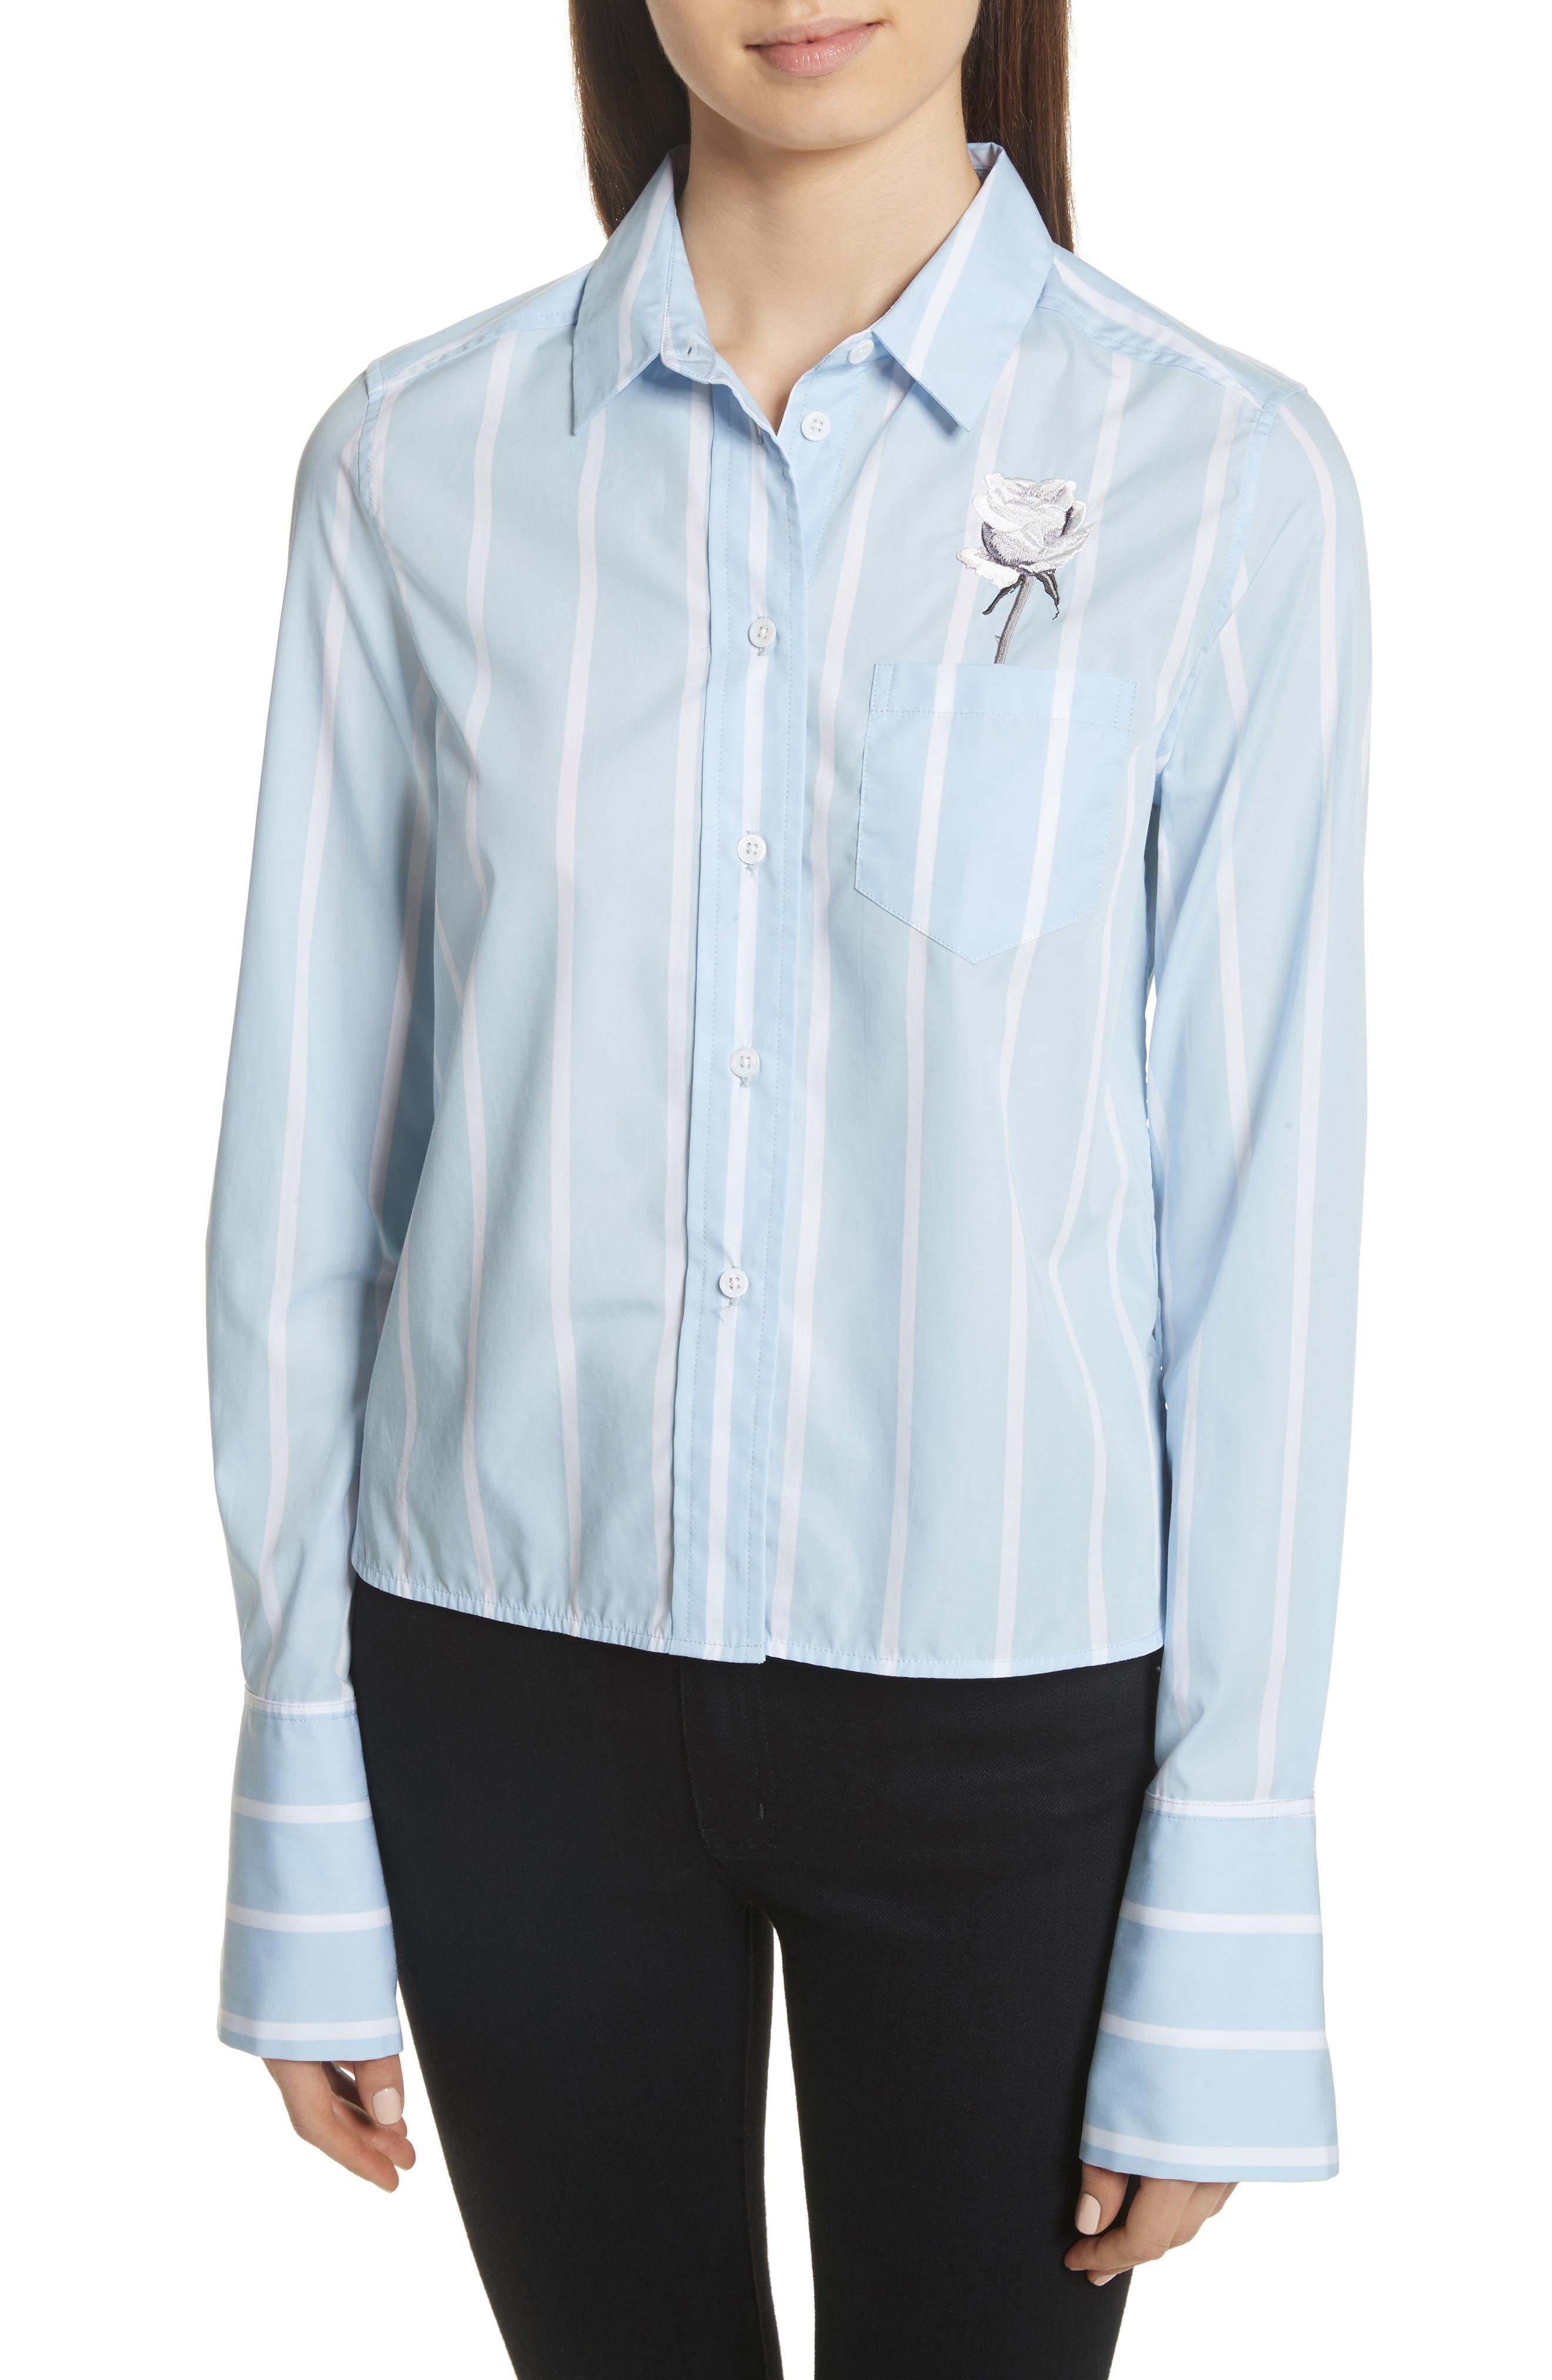 Main Image - Equipment Huntley Embroidered Stripe Cotton Shirt